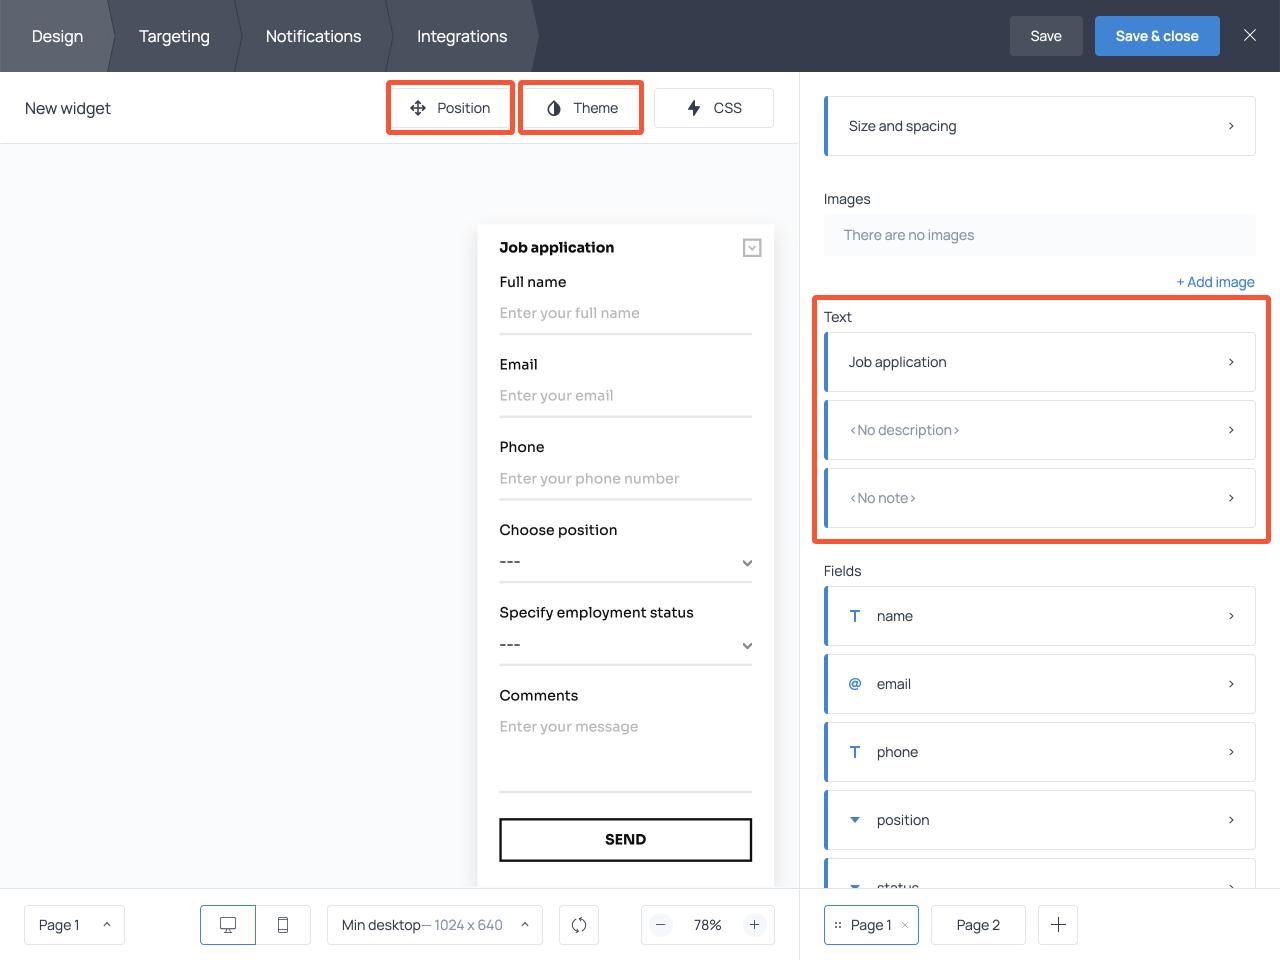 How to create a job application form for a website using Getsitecontrol